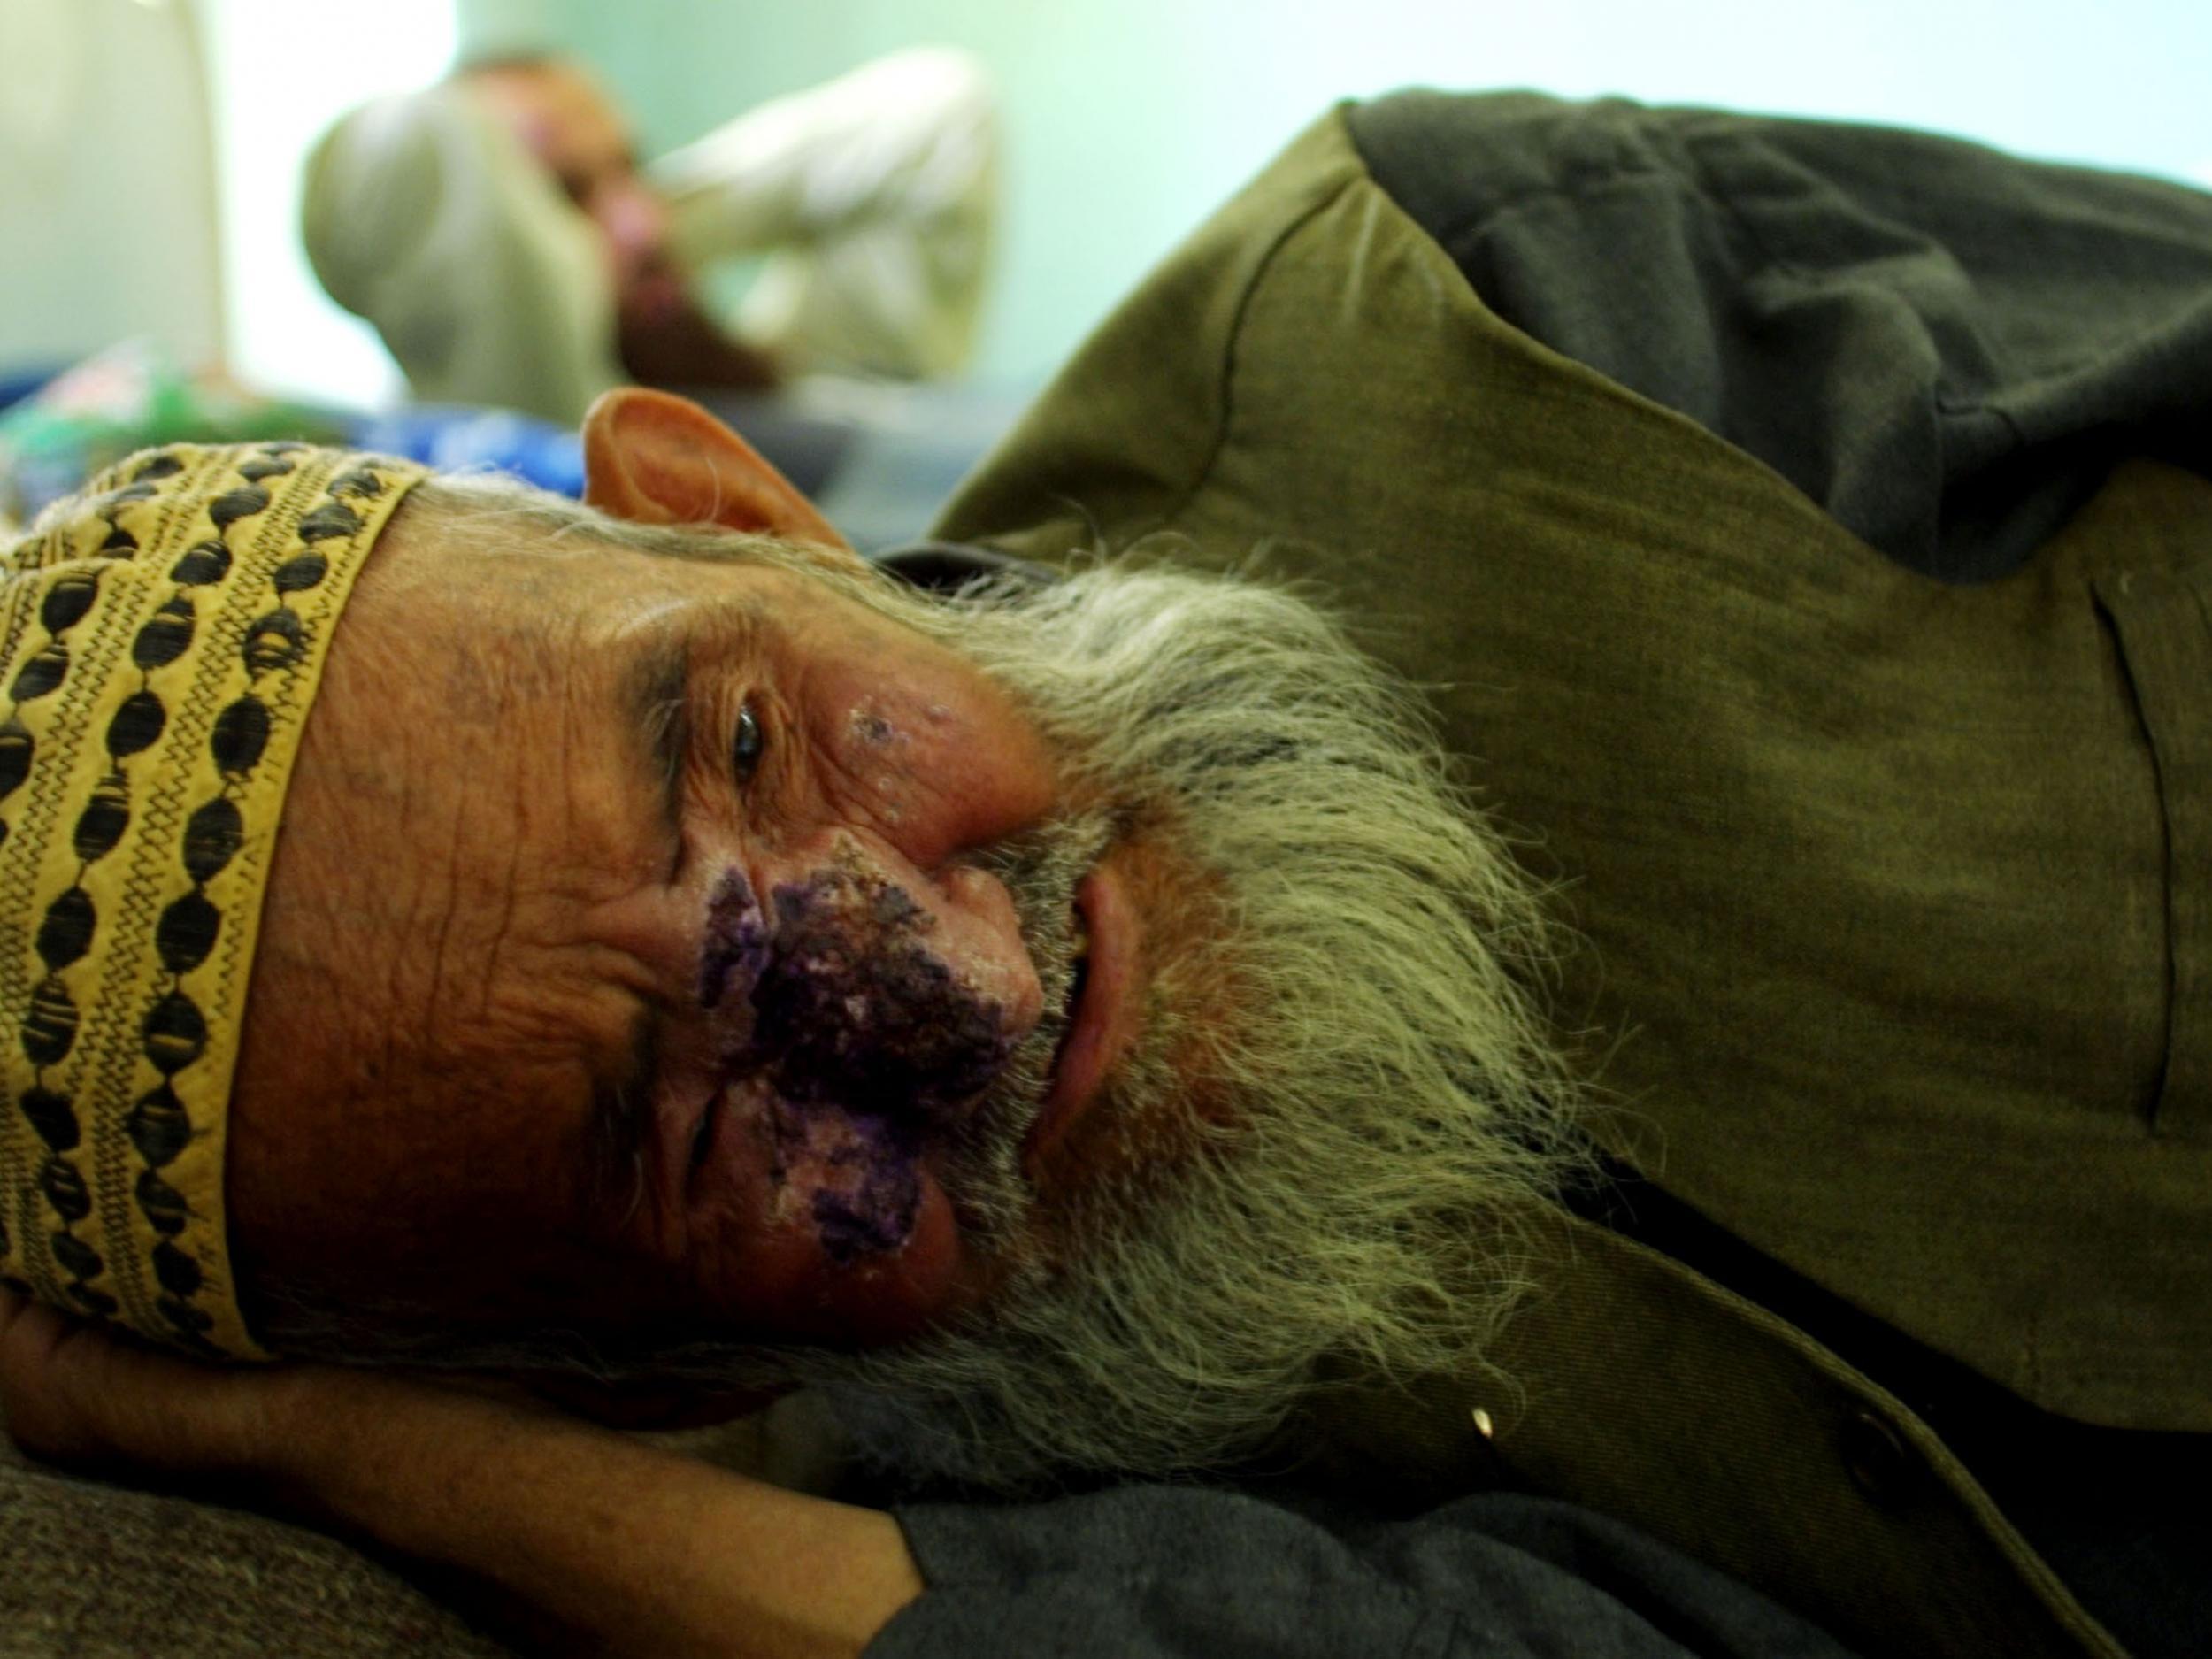 Cutaneous leishmaniasis: Disfiguring tropical disease sweeps across Middle East